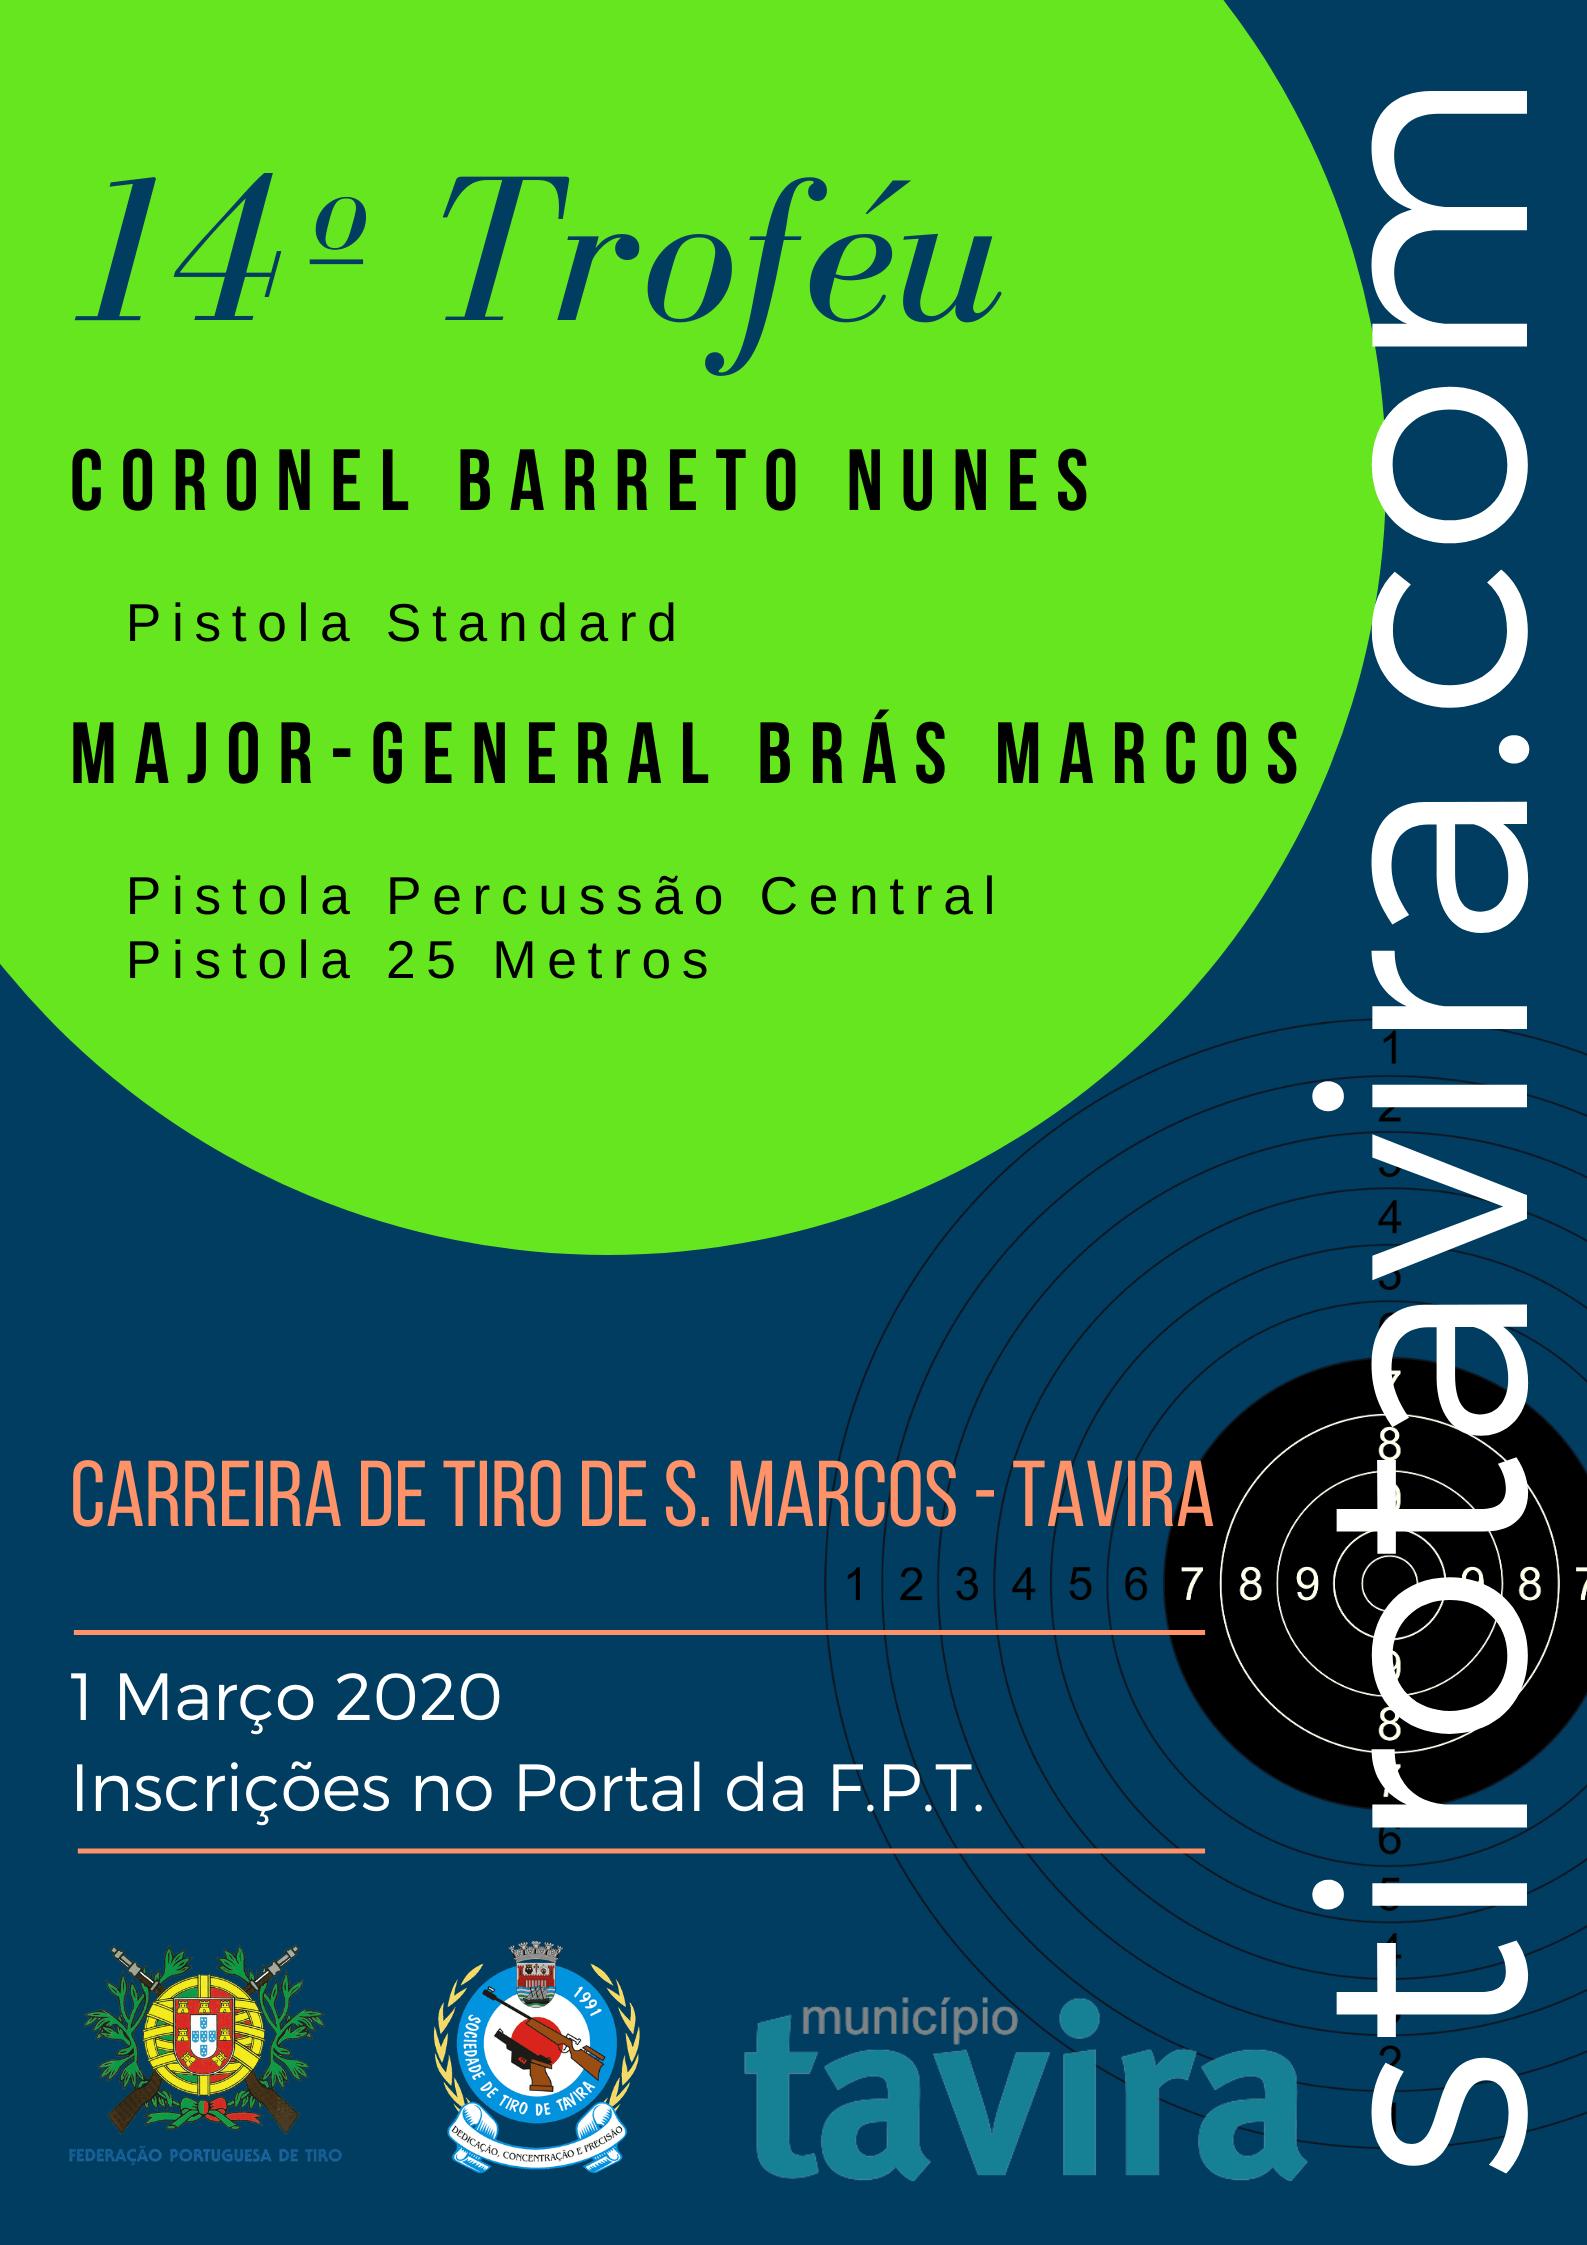 14º Troféu Cor Barreto Nunes / Maj-Gen Brás Marcos